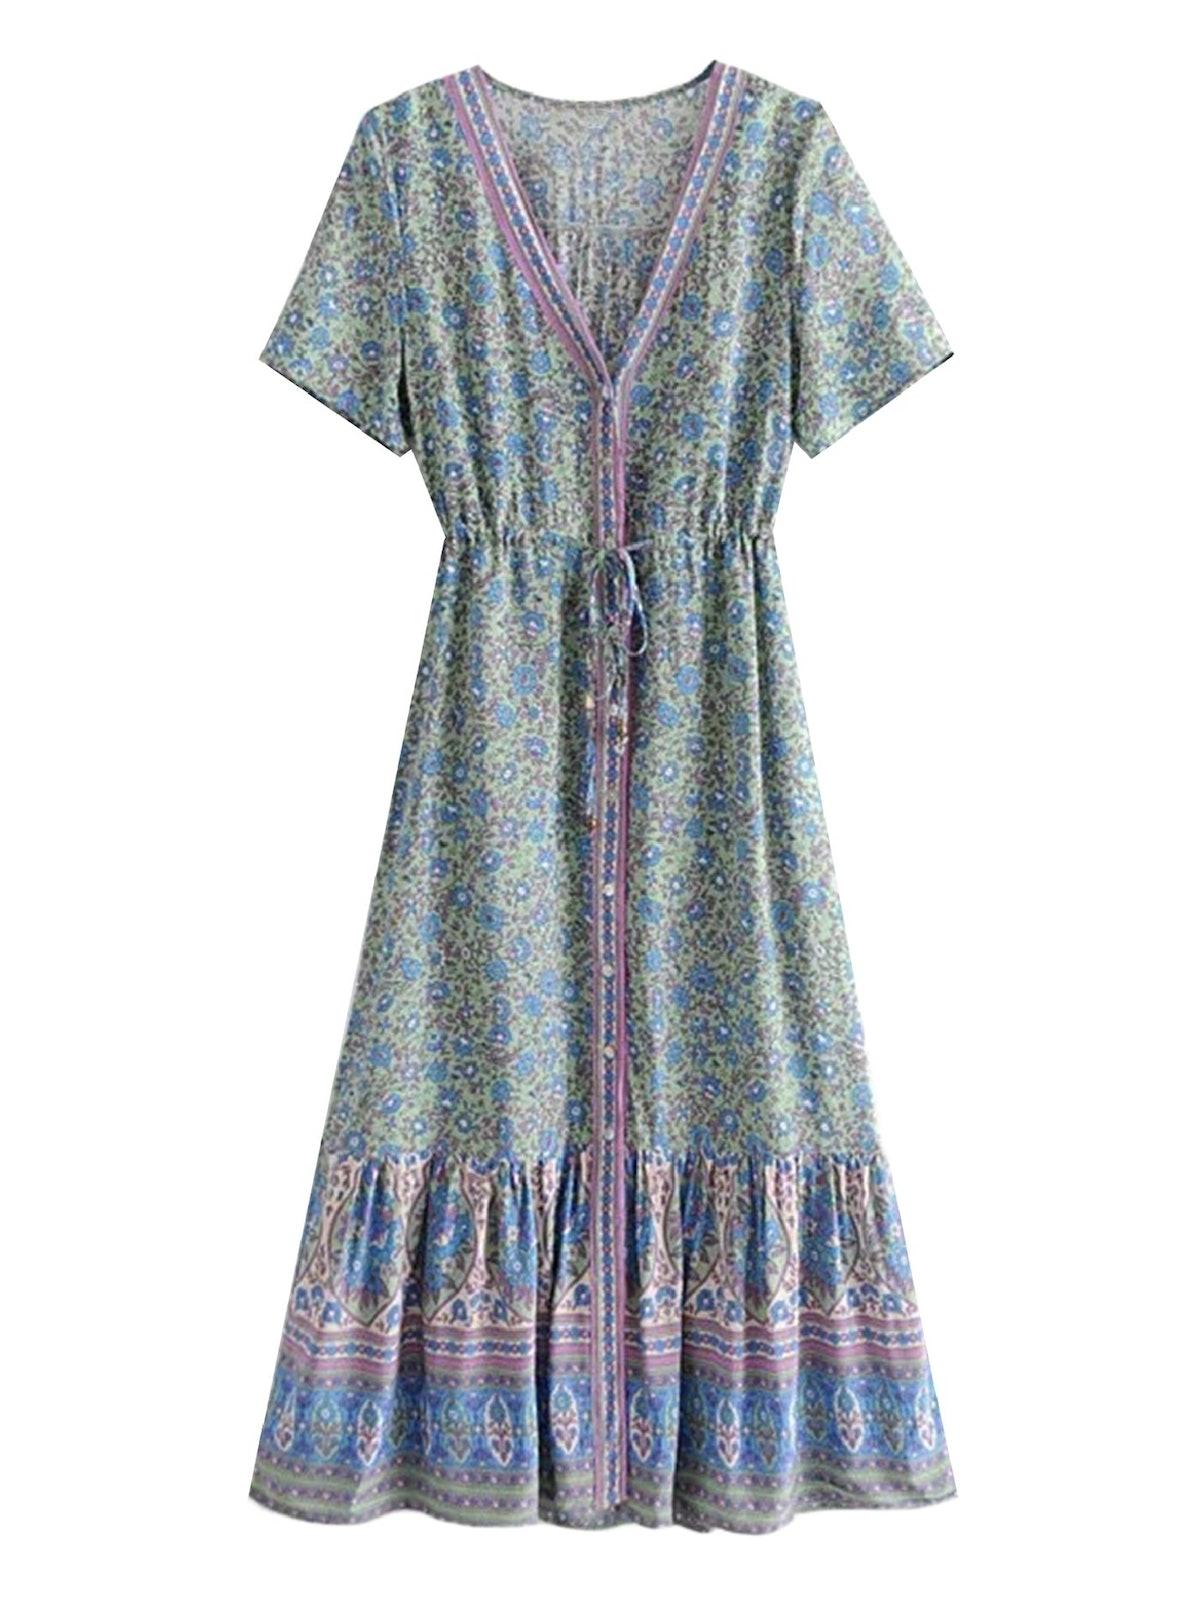 'SCARLET' FLORAL PRINT TIE WAIST MAXI DRESS